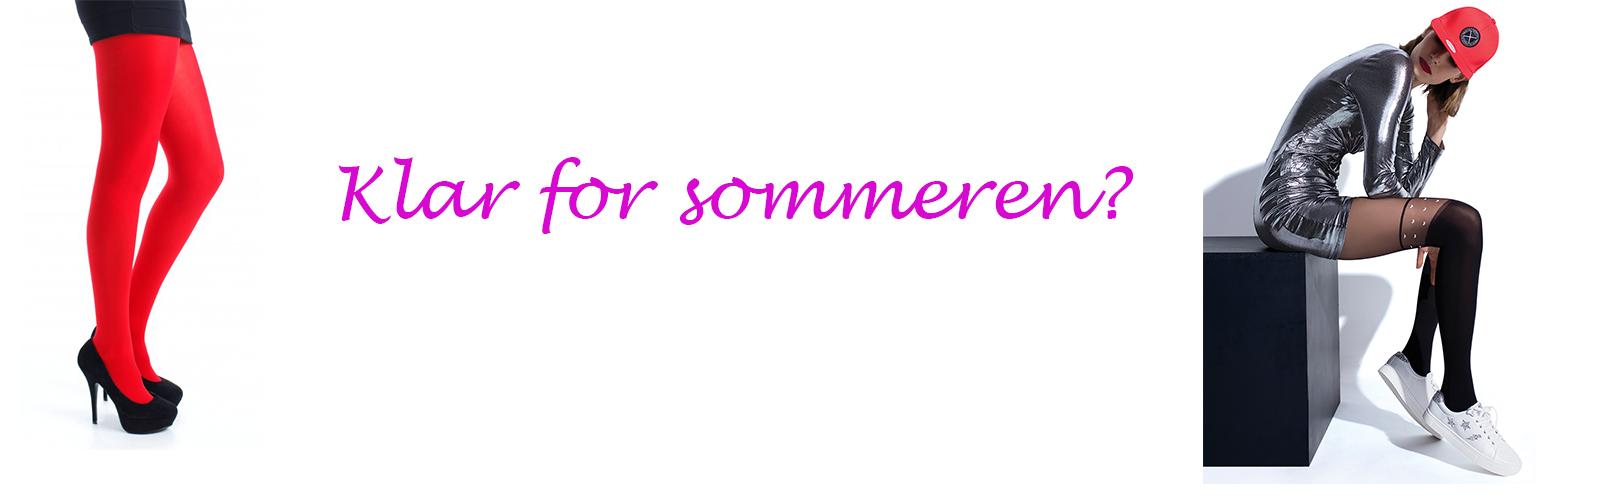 51c126938f5 Strømpebukser cutie